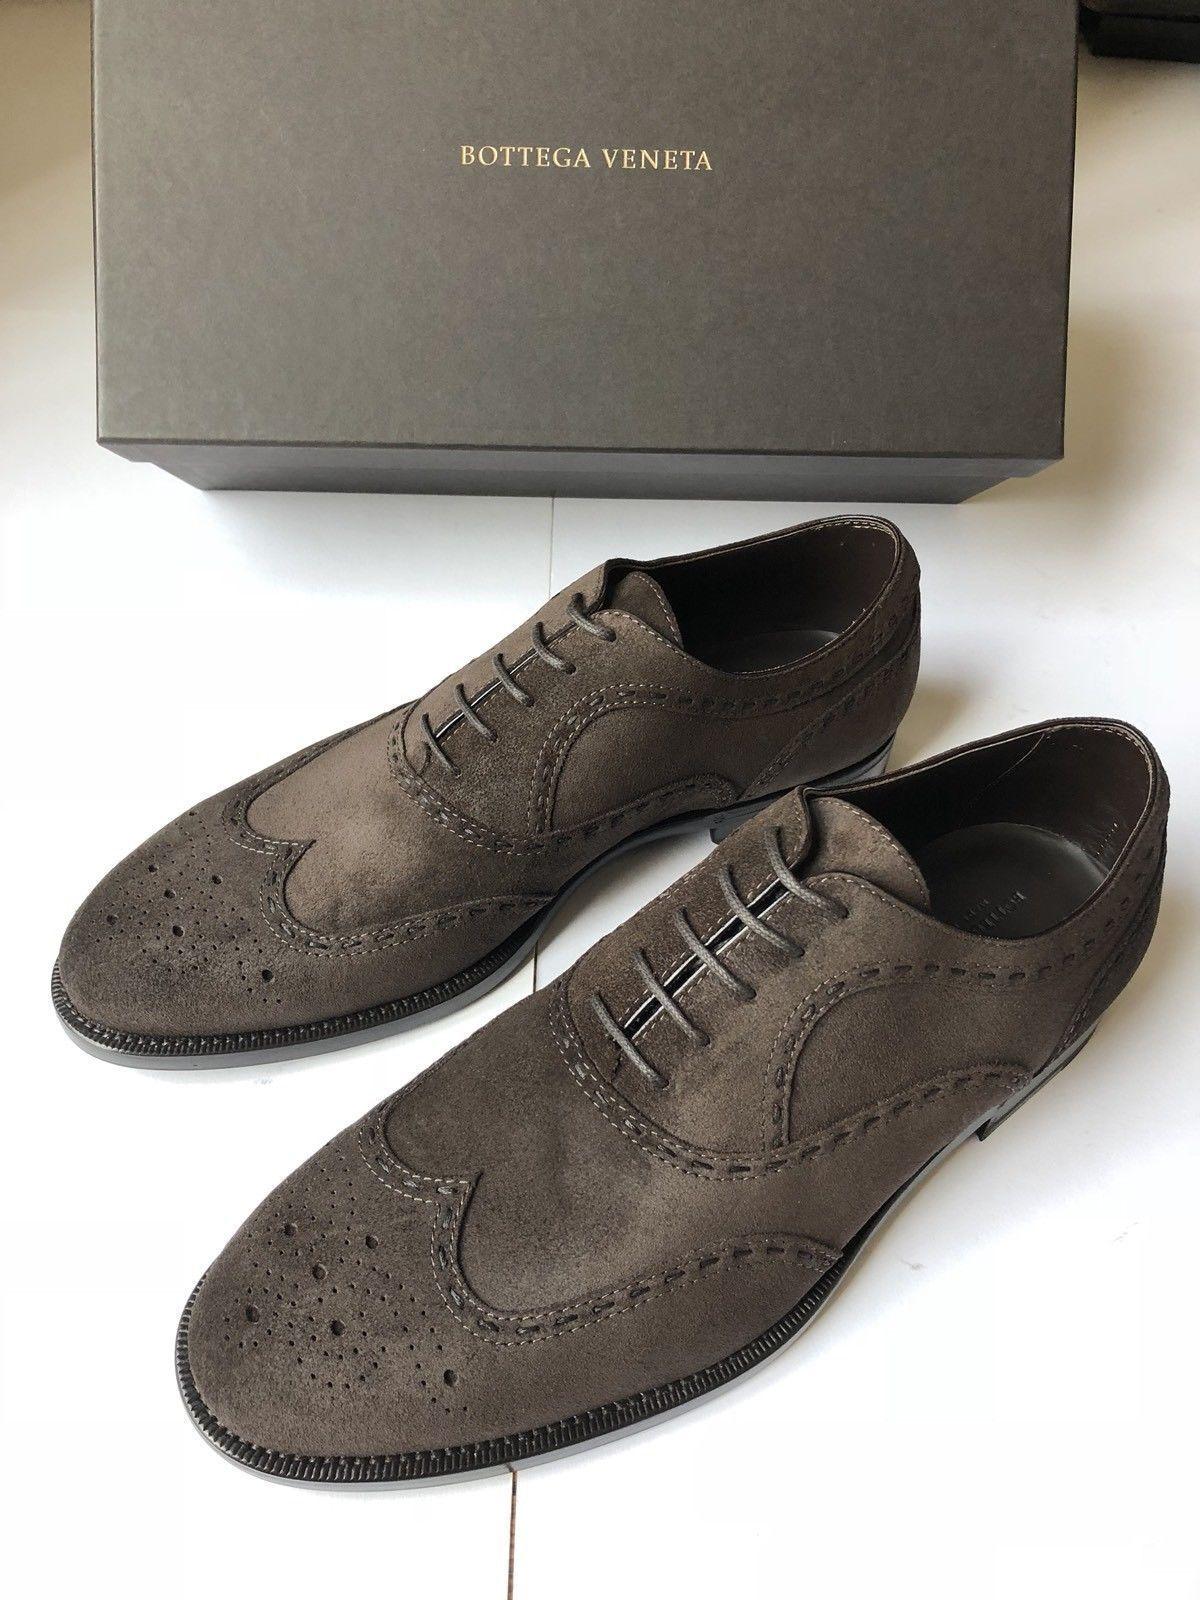 BOTTEGA VENETA Nottingham scarpe Calf Suede Leather US 9 EU 42   NEW